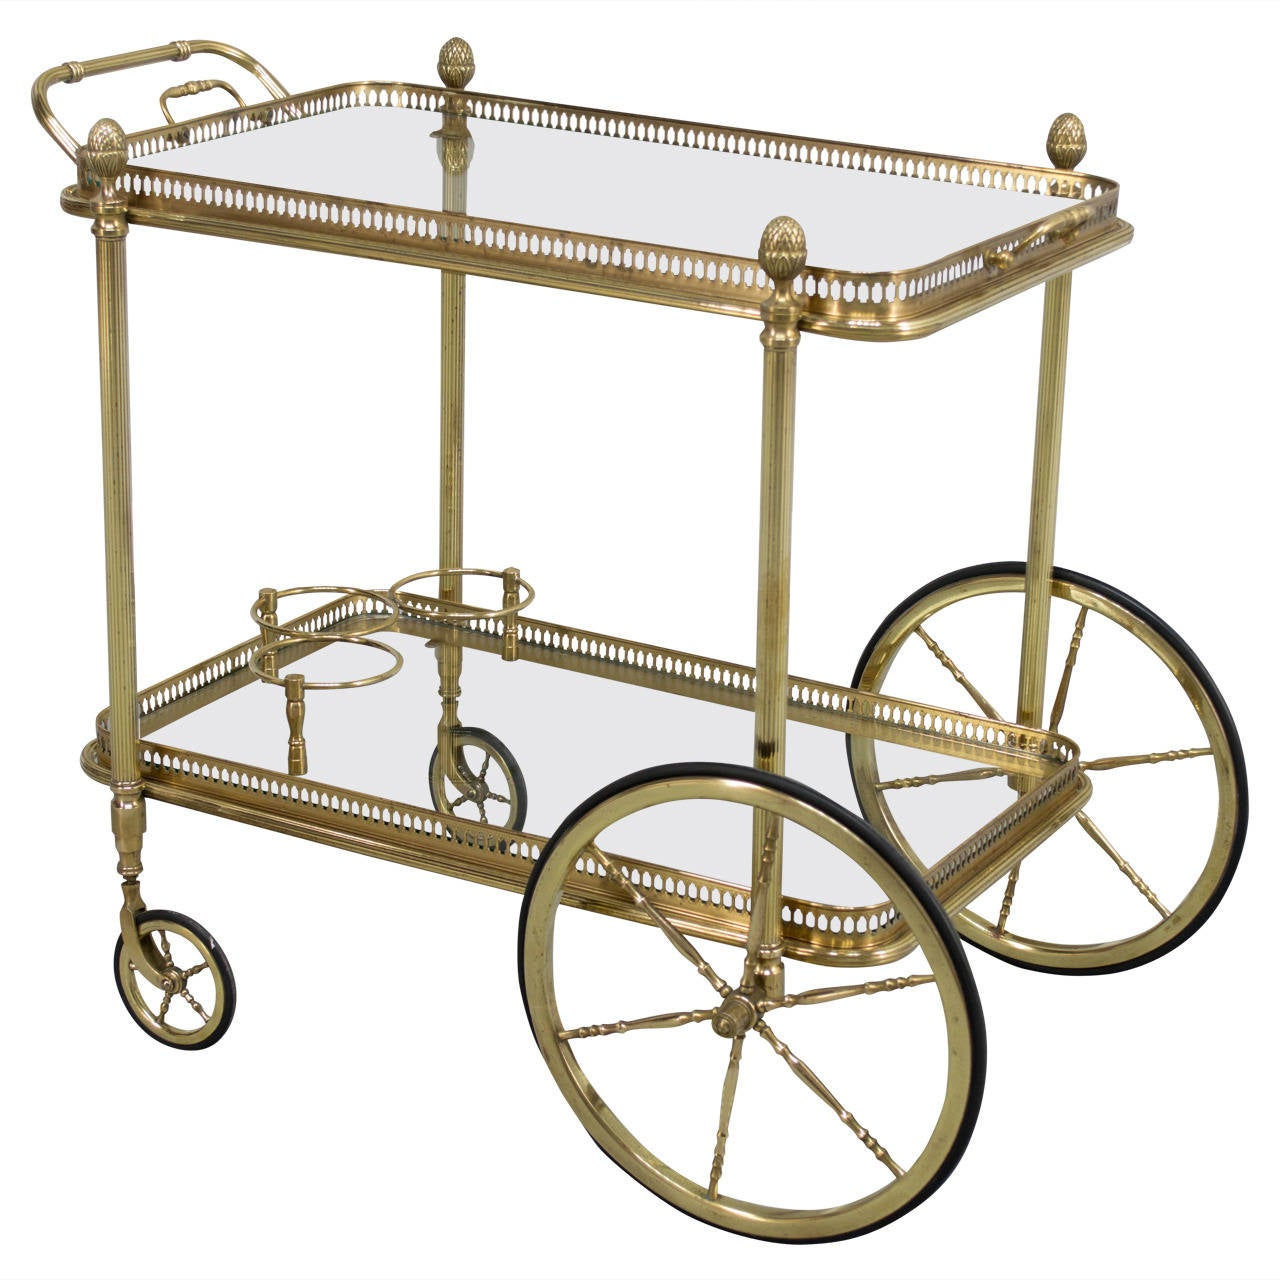 french brass bar cart at 1stdibs. Black Bedroom Furniture Sets. Home Design Ideas